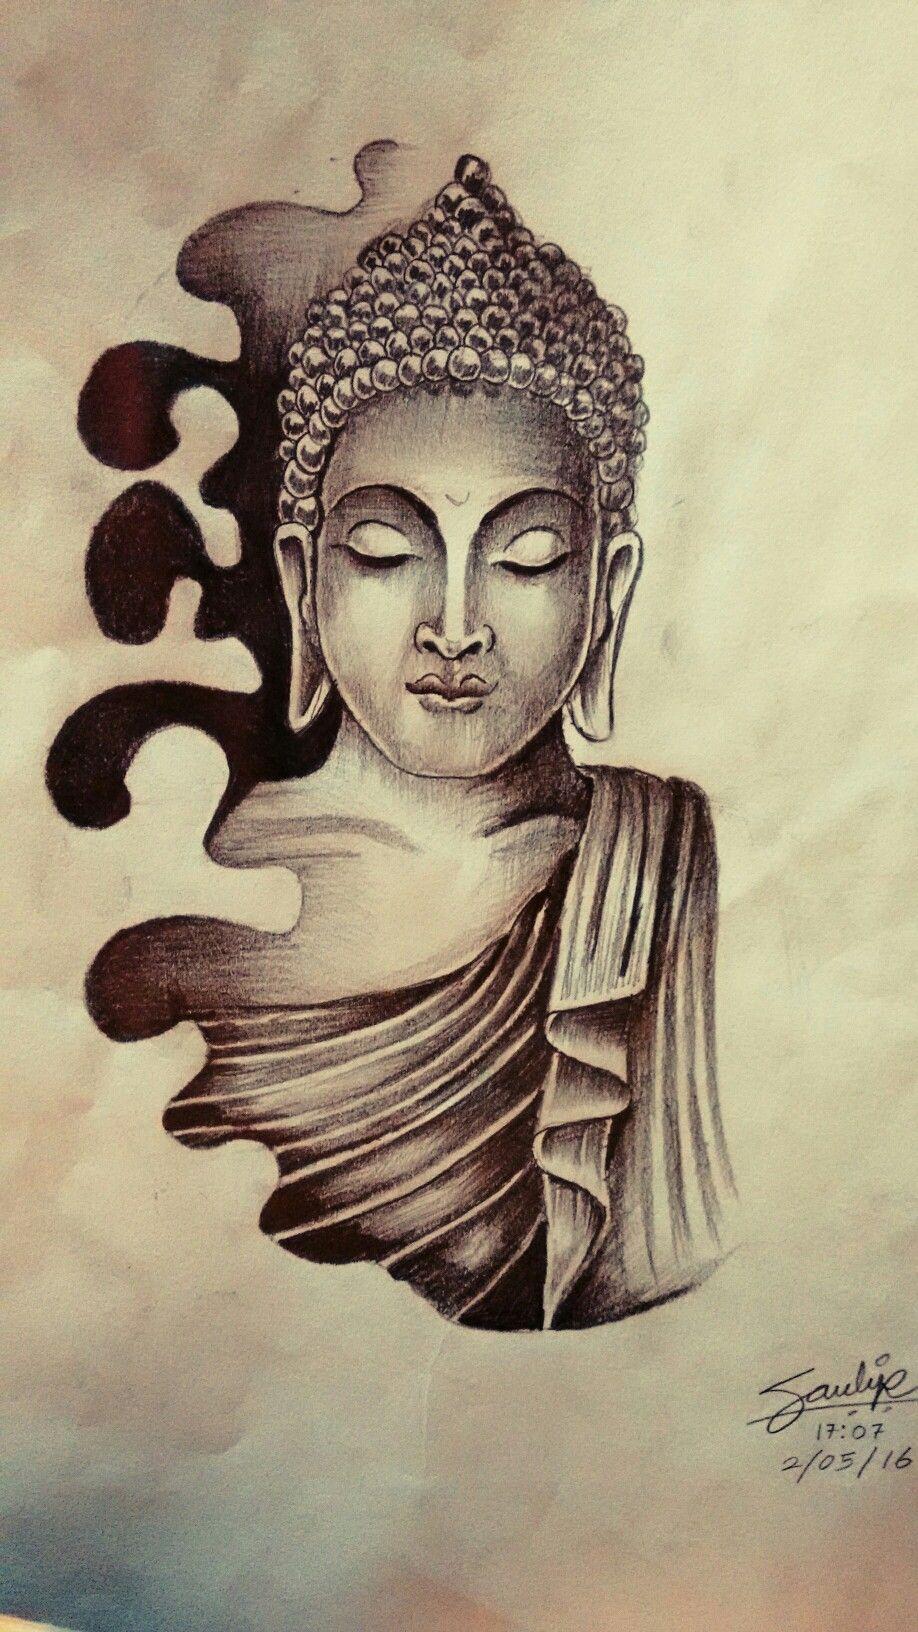 LORD Buddha Tattoo Drawing by Artist Sandip Uttam at ... for Gautam Buddha Face Tattoo  156eri